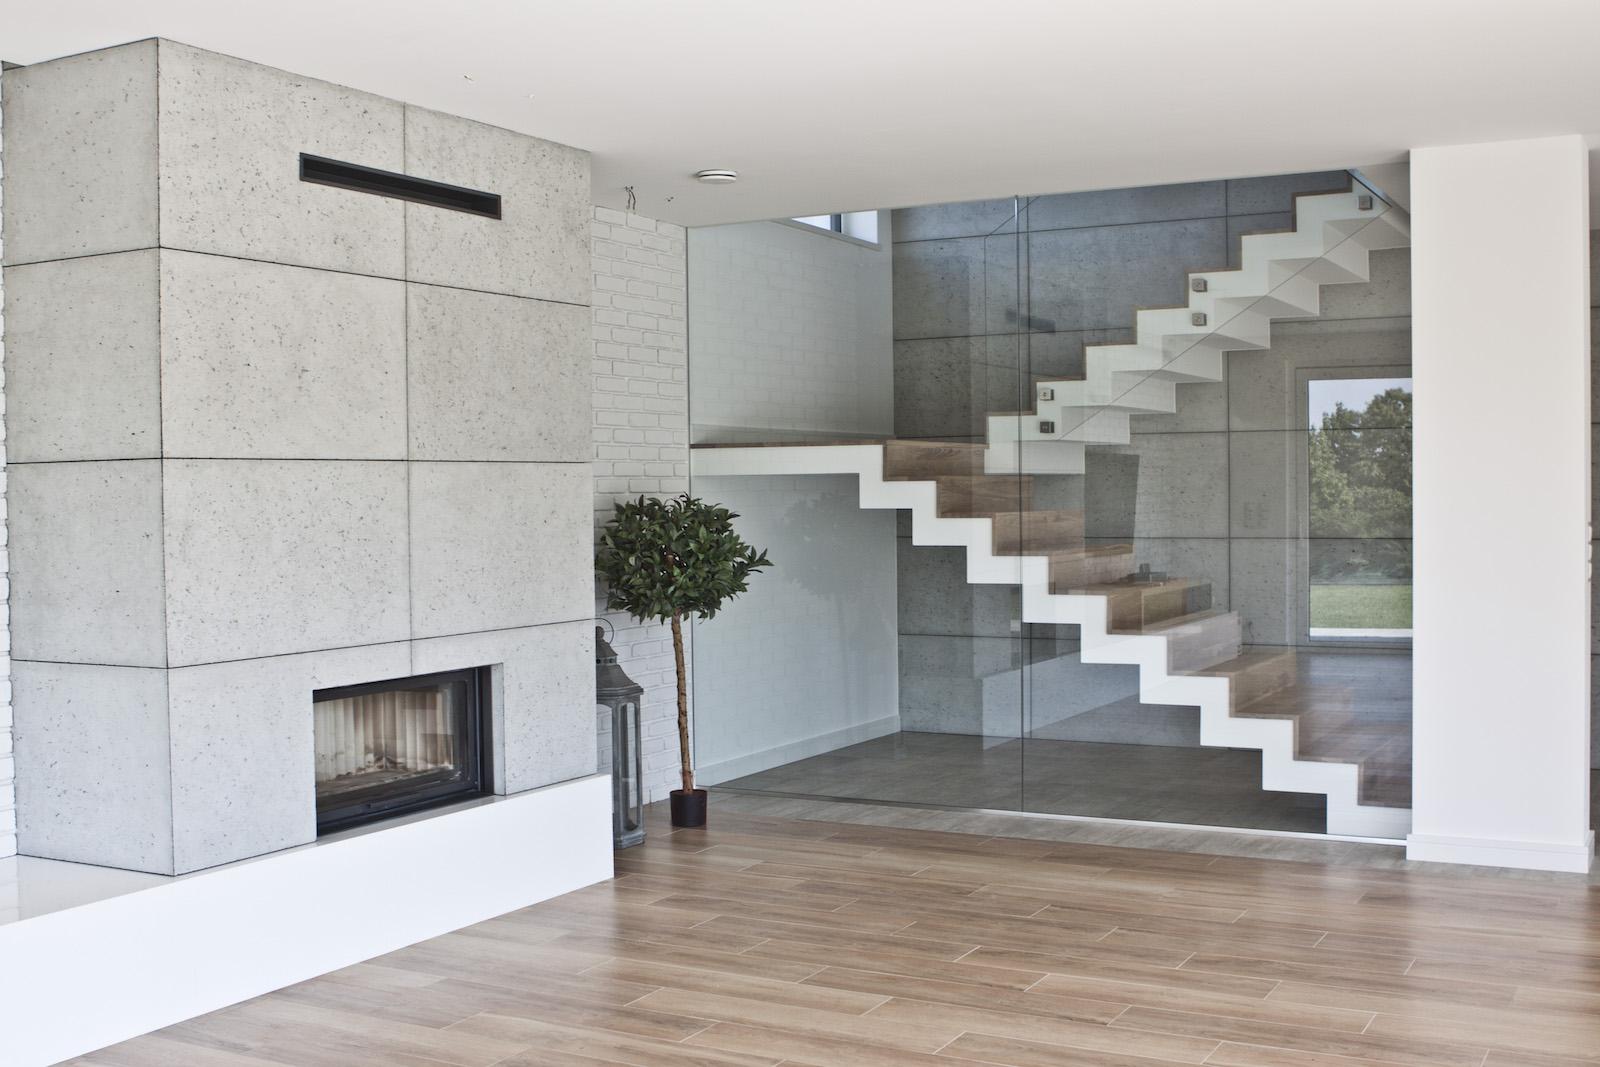 nowo beton architektoniczny concraft art ceramika. Black Bedroom Furniture Sets. Home Design Ideas